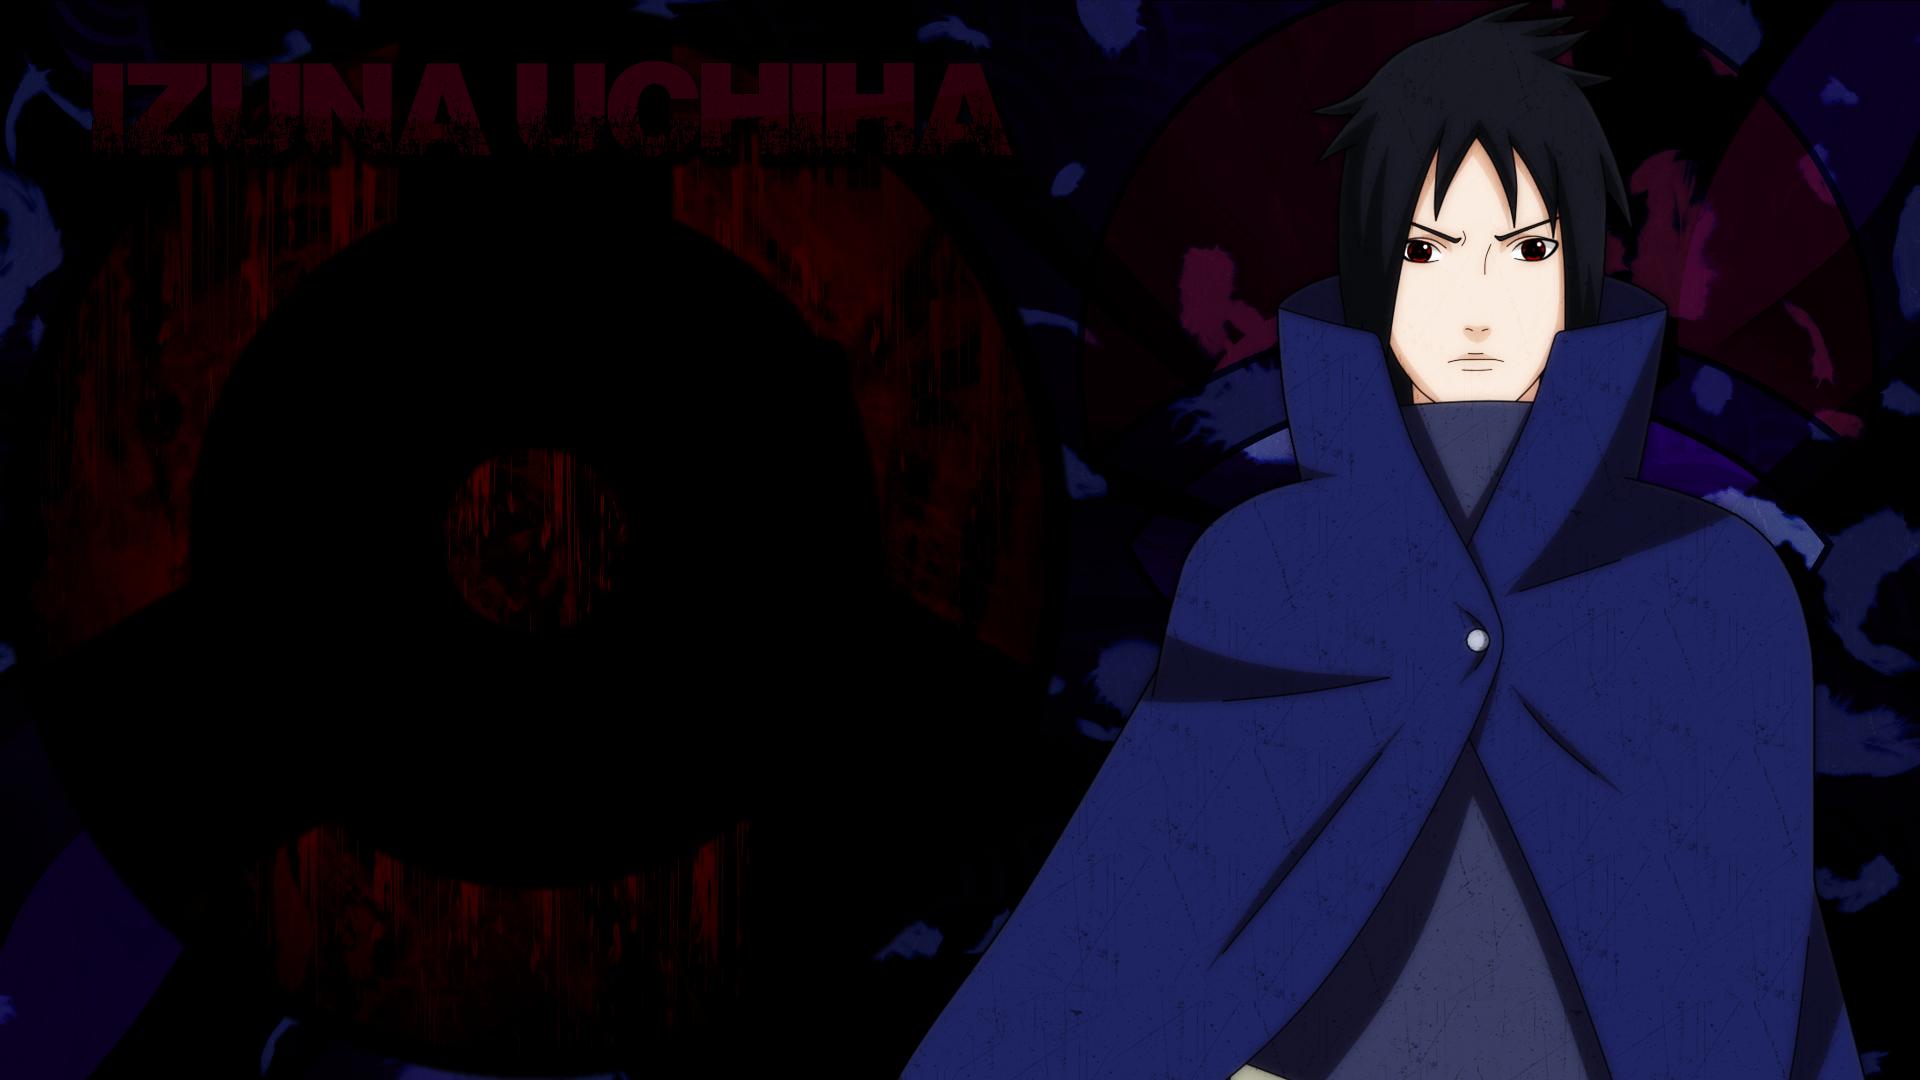 Izuna Uchiha wallpaper by FDQ on DeviantArt